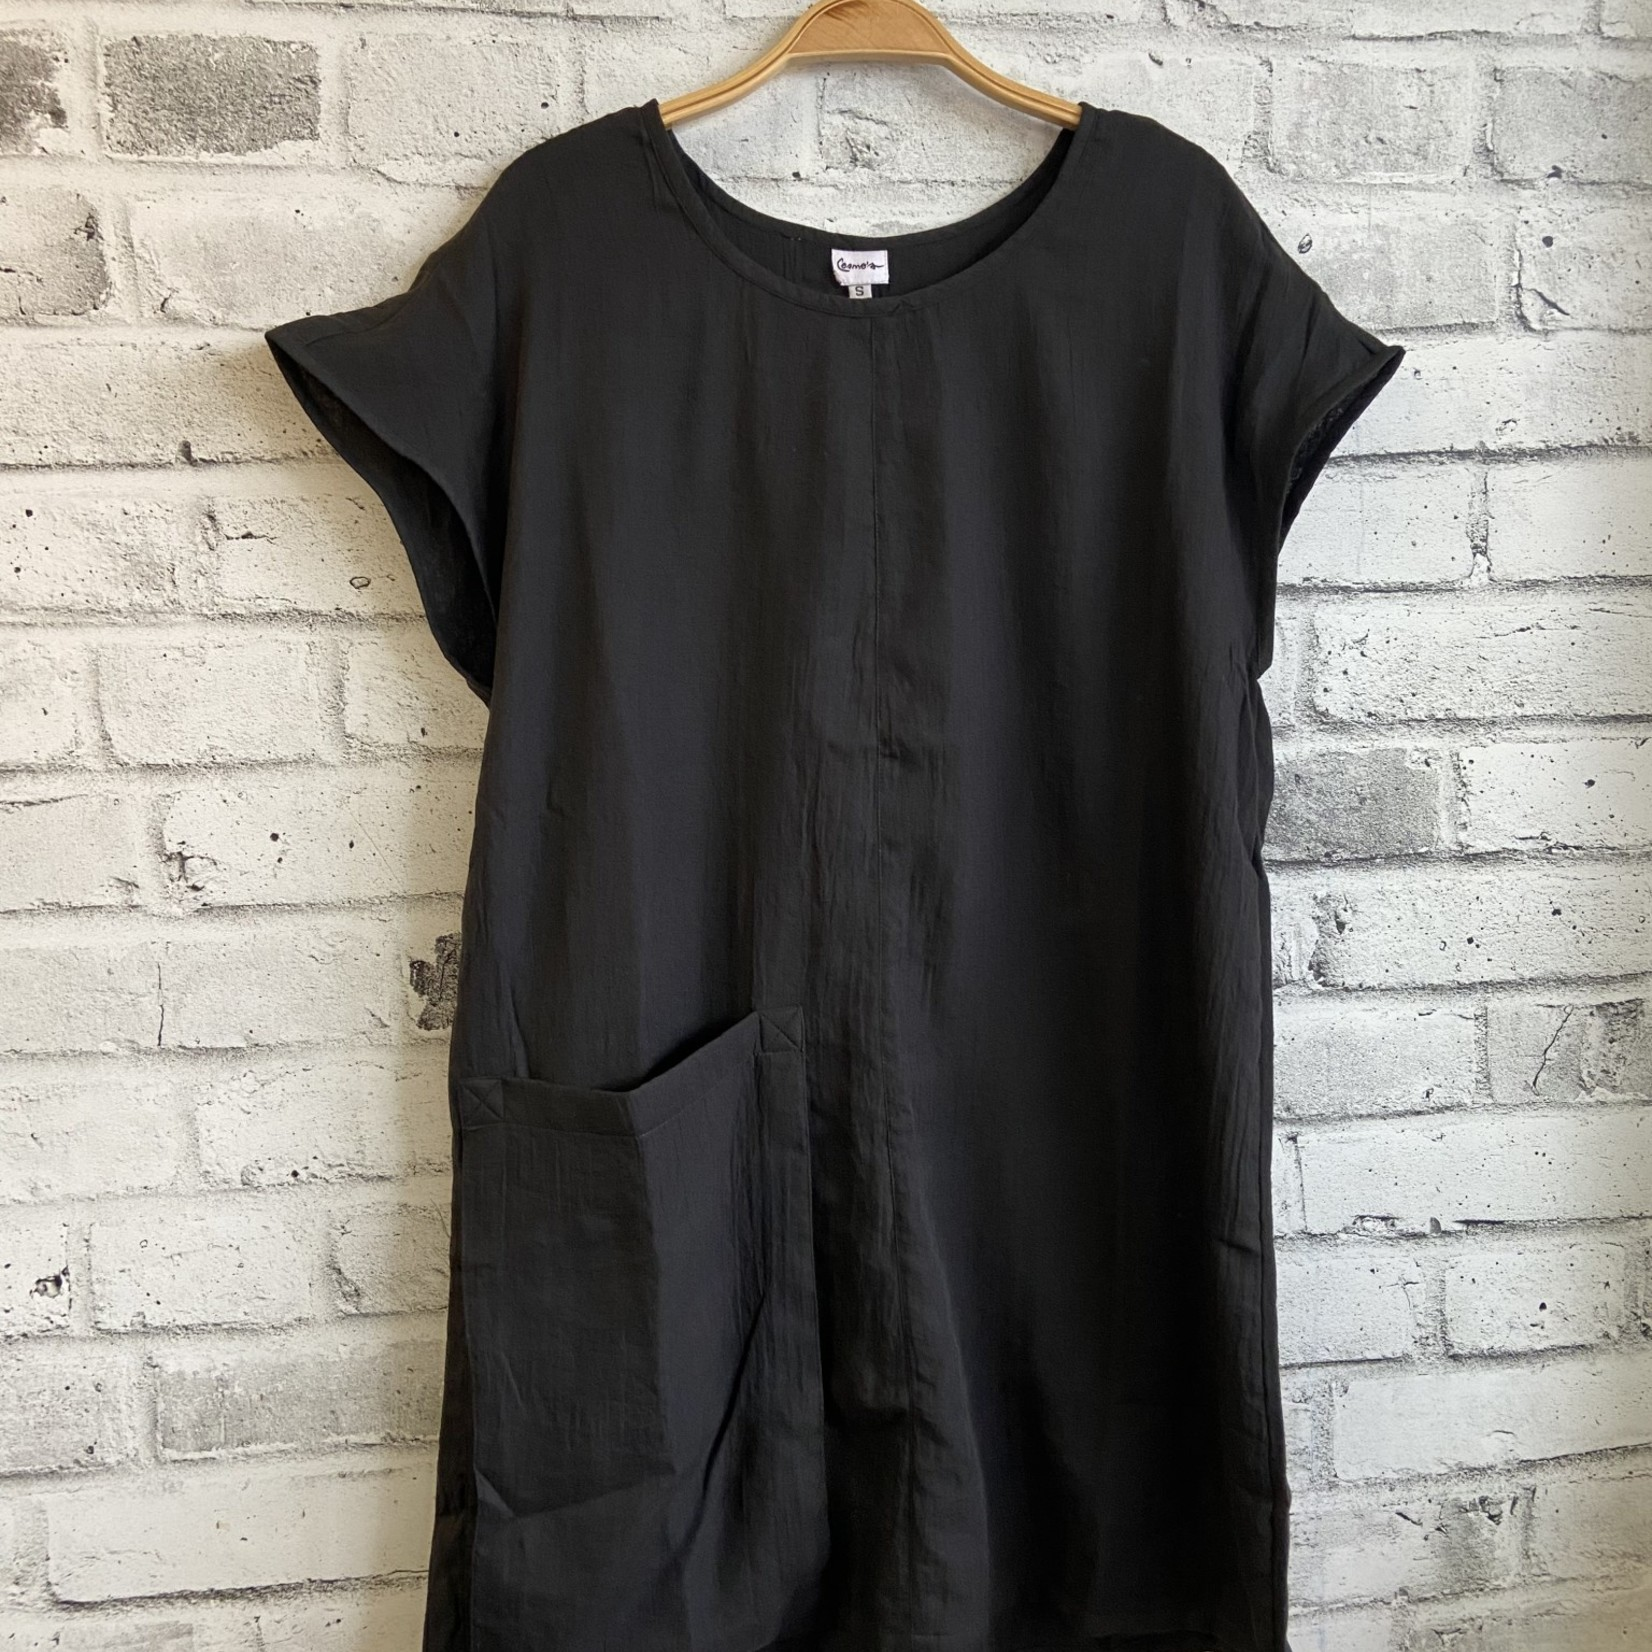 Cosmo's Impex Enterprises Tunic Dress 802